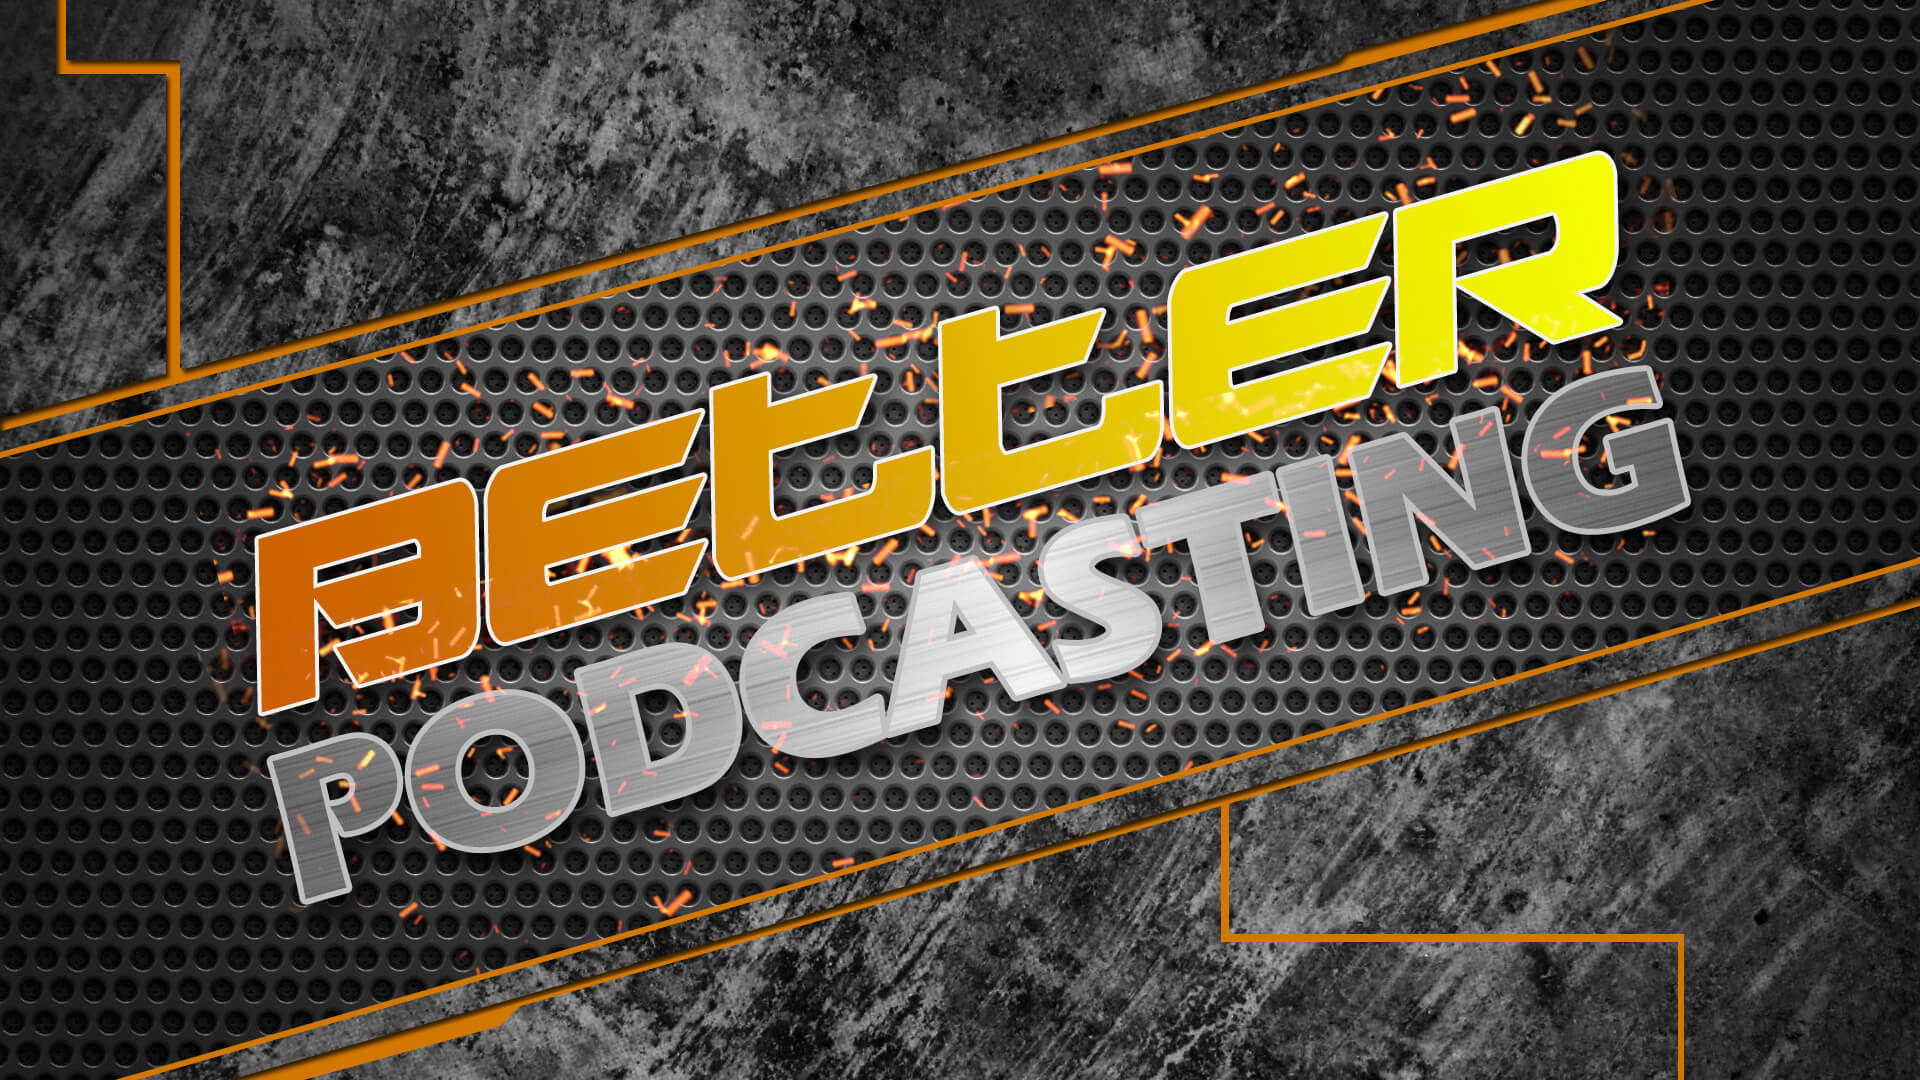 betterpodcasting-logo-1920x1080